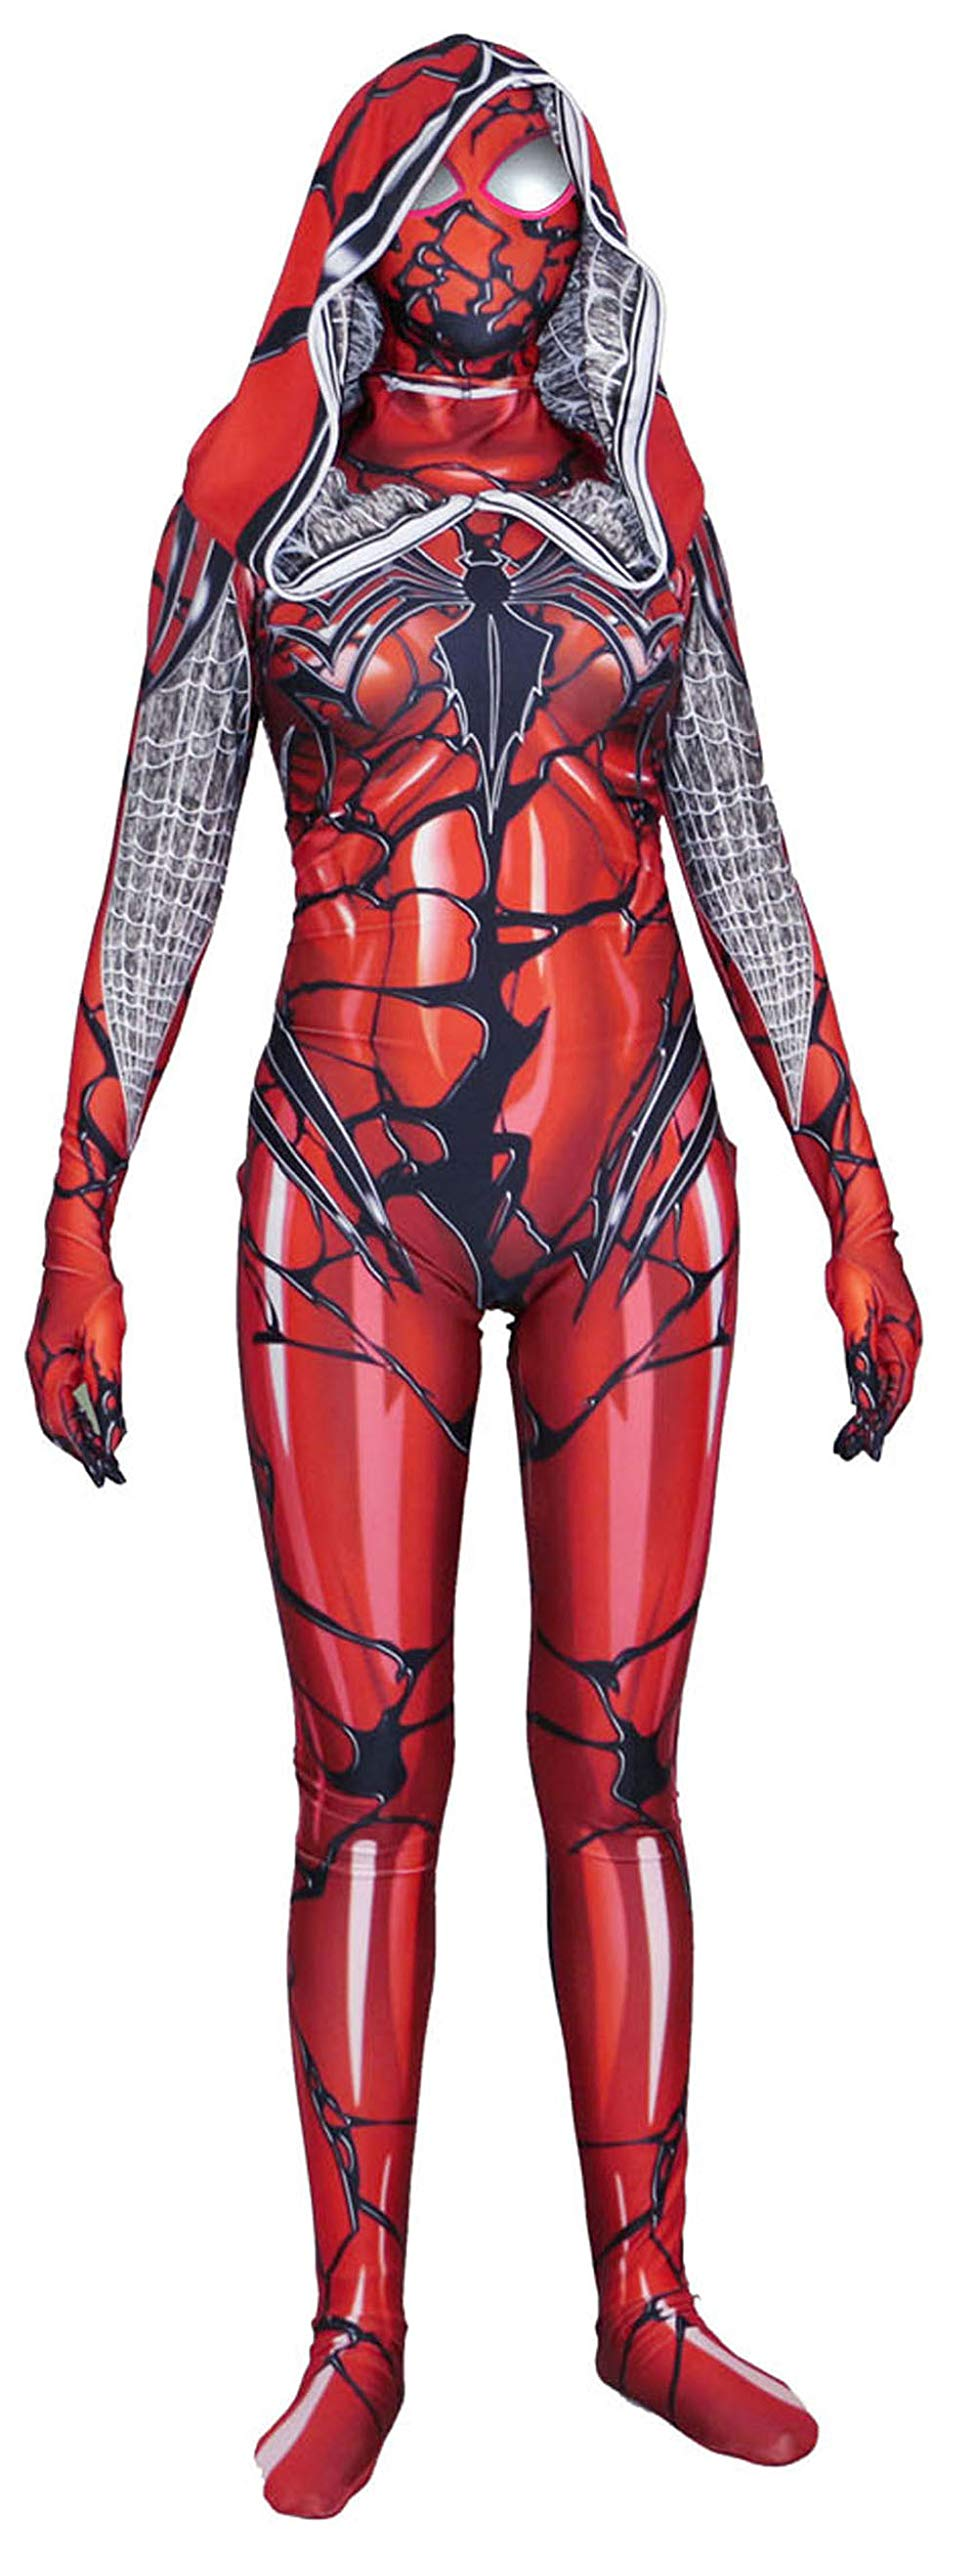 - 71Xn8FC IuL - Riekinc Womens Superhero Zentai Suits Halloween Cosplay Costumes 3D Style Audlt/Kids